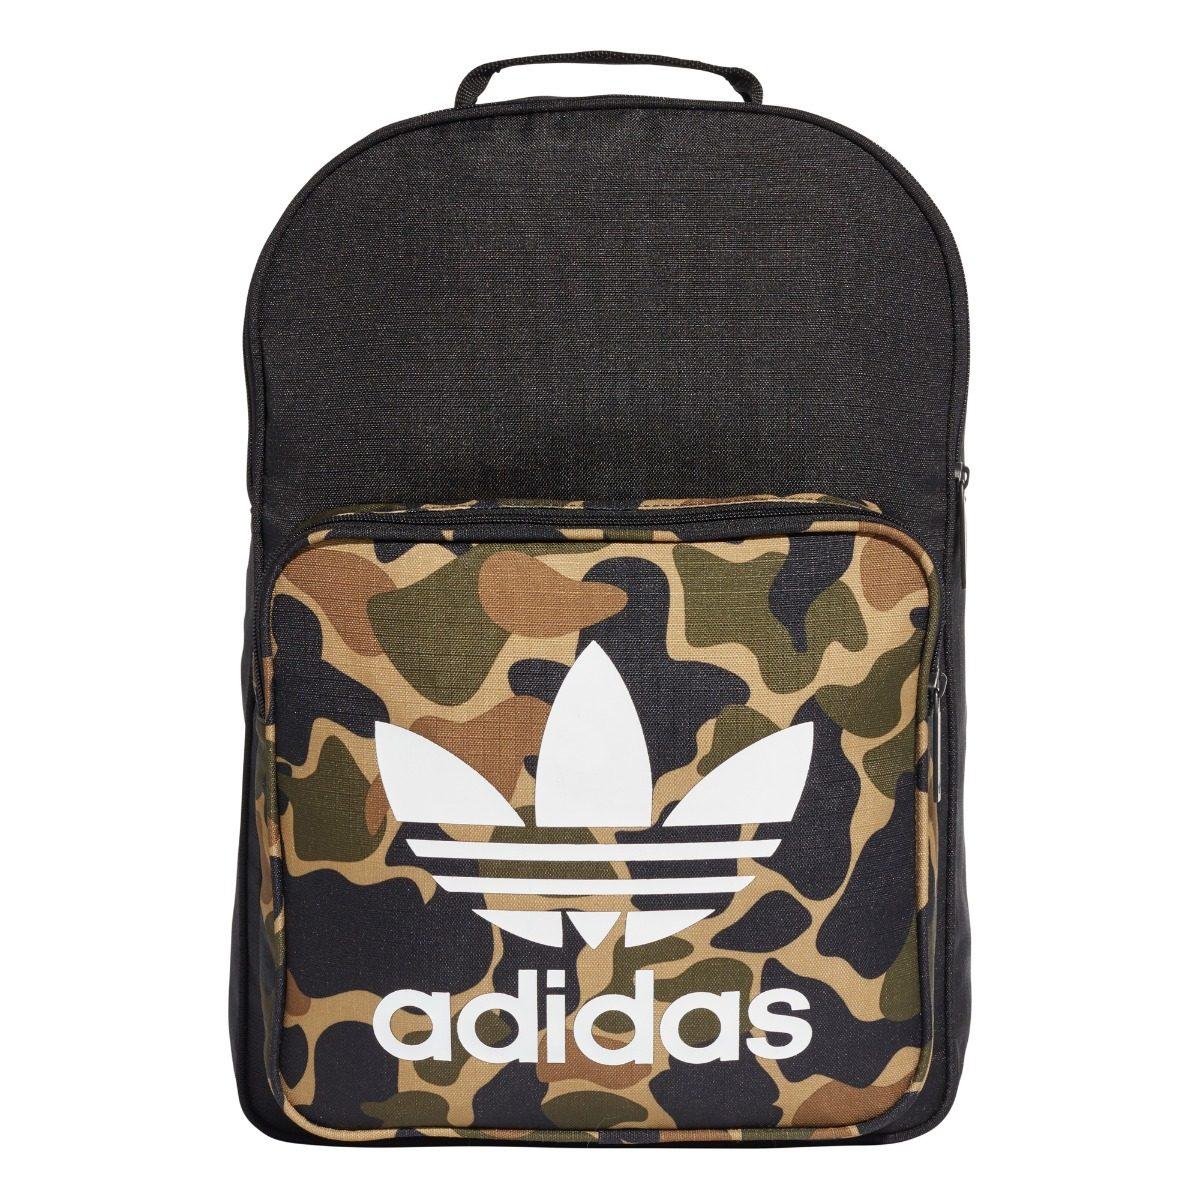 Camuflaje Originals1 00 En 494 Adidas Mercado Classic Mochila 0OwkZ8nXNP